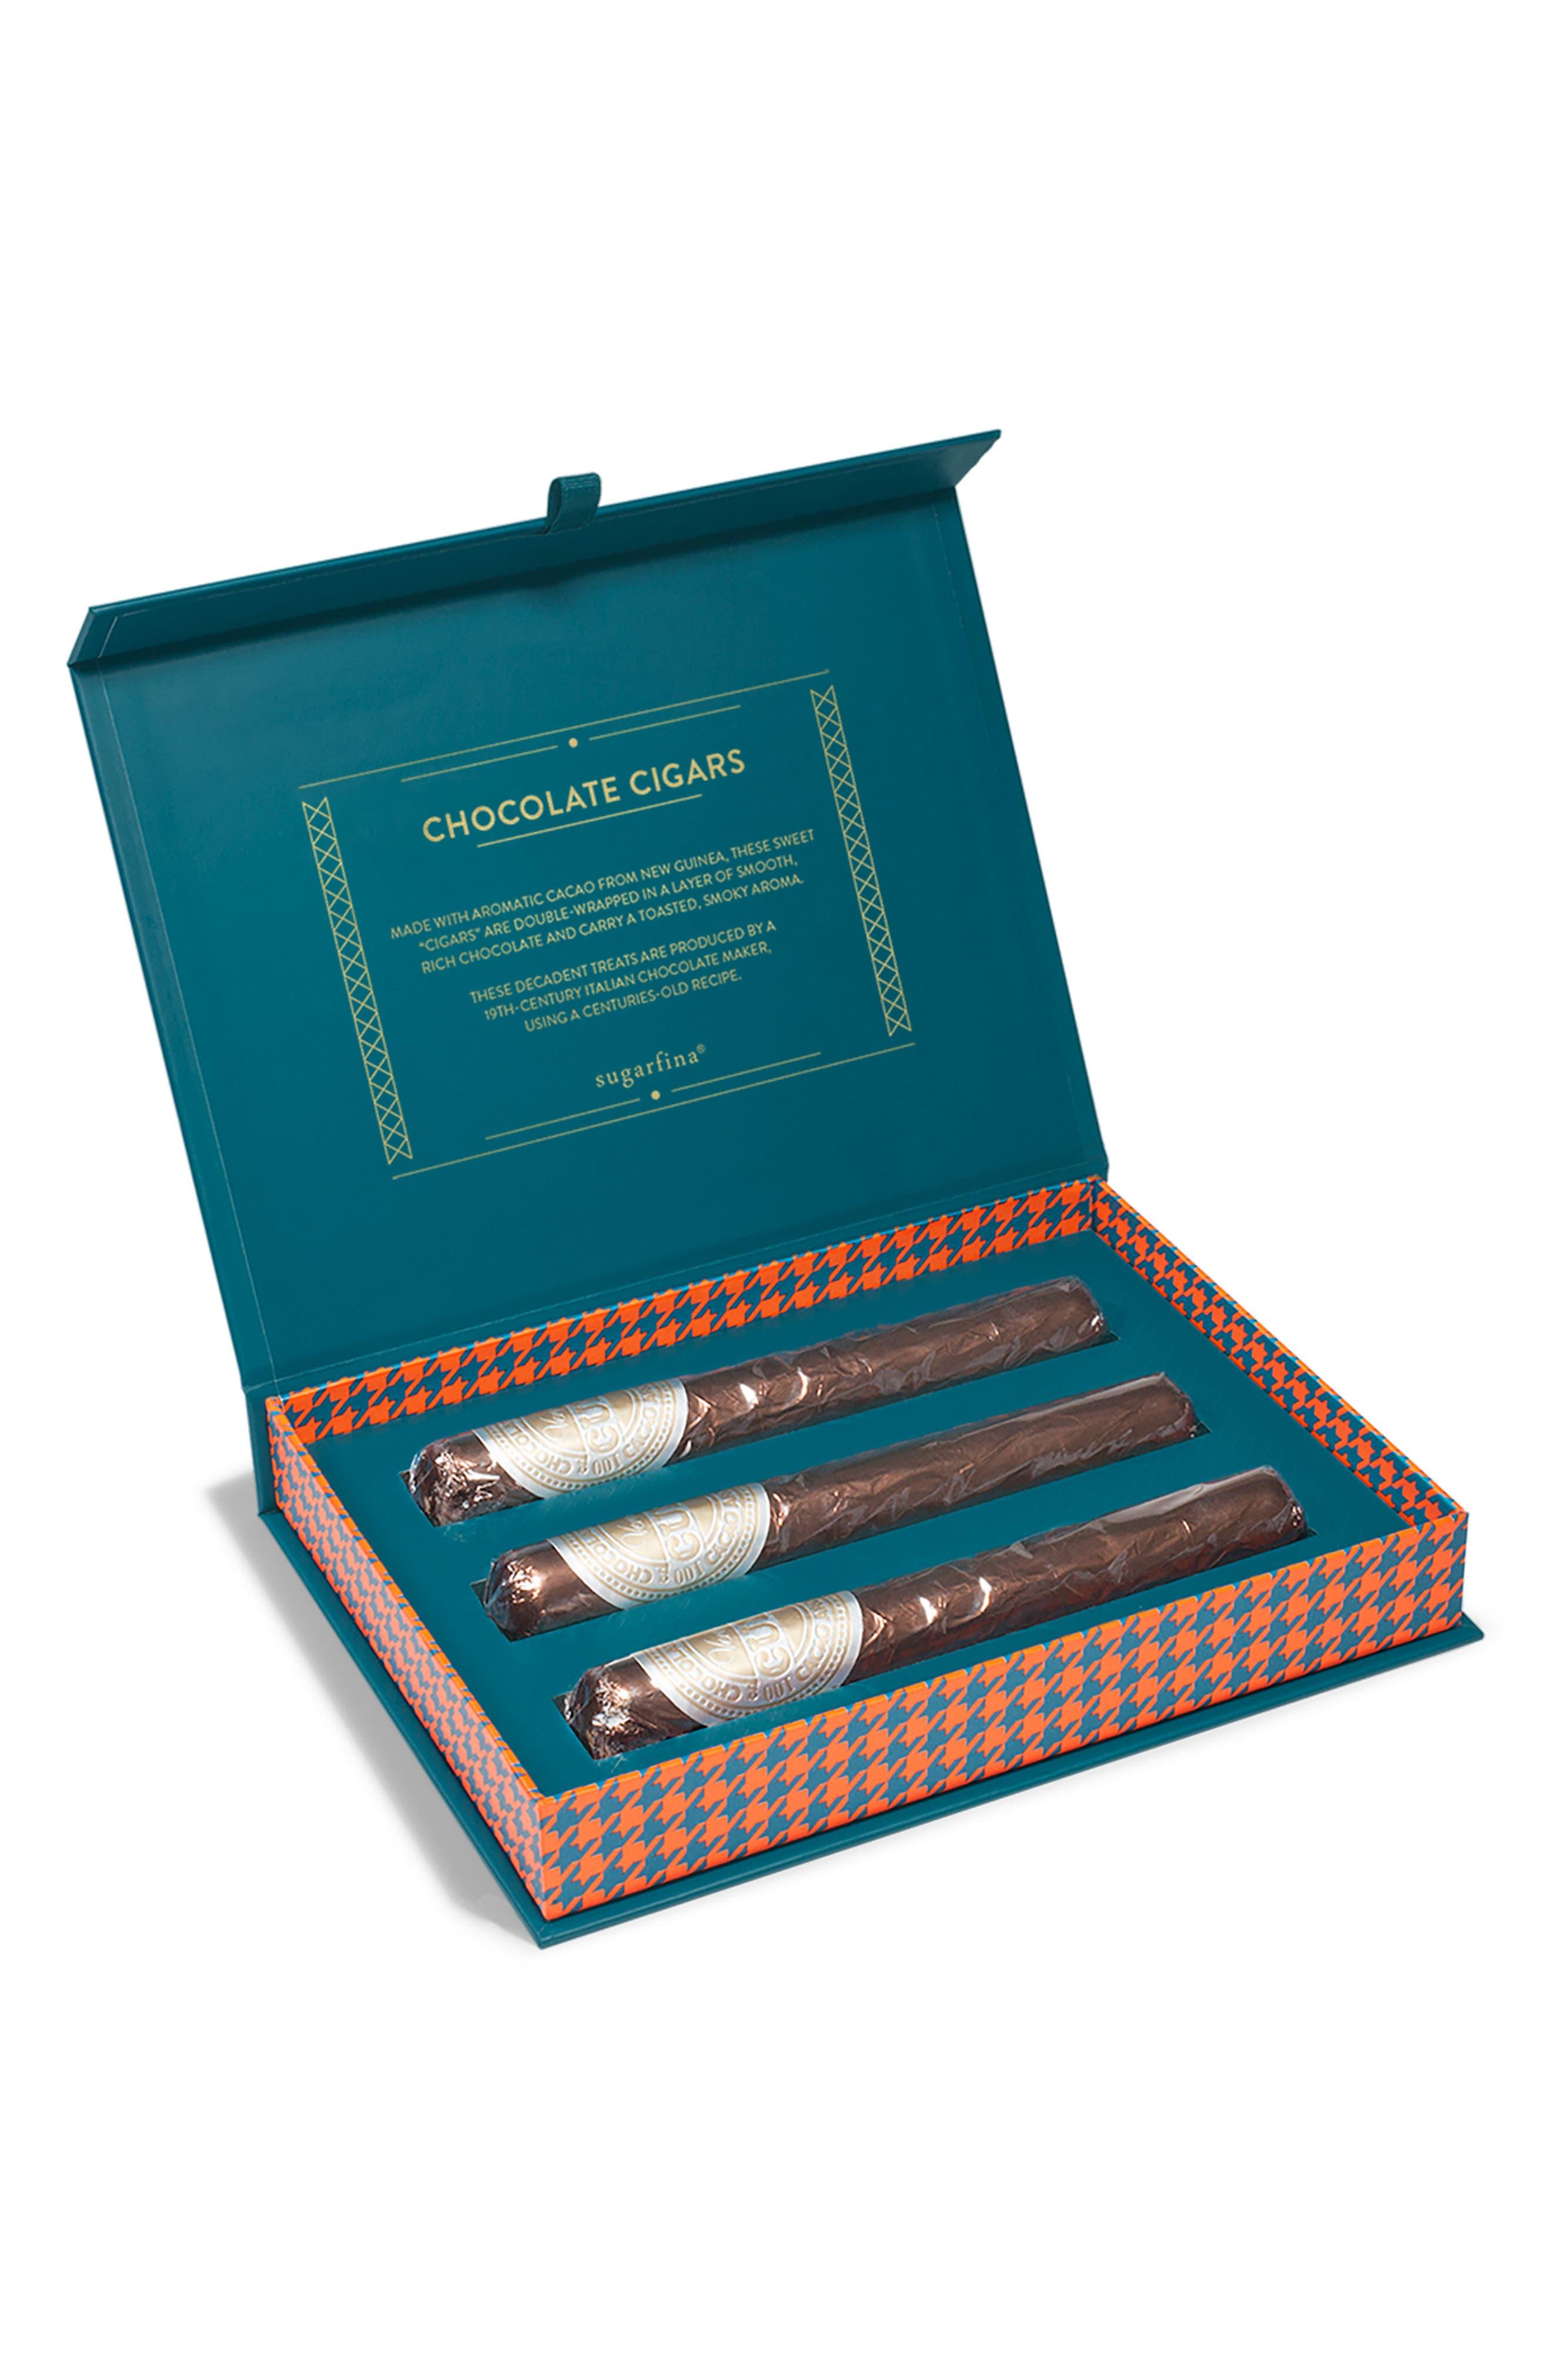 Sweet & Smokin' 3-Piece Chocolate Cigar Box,                             Main thumbnail 1, color,                             BLUE